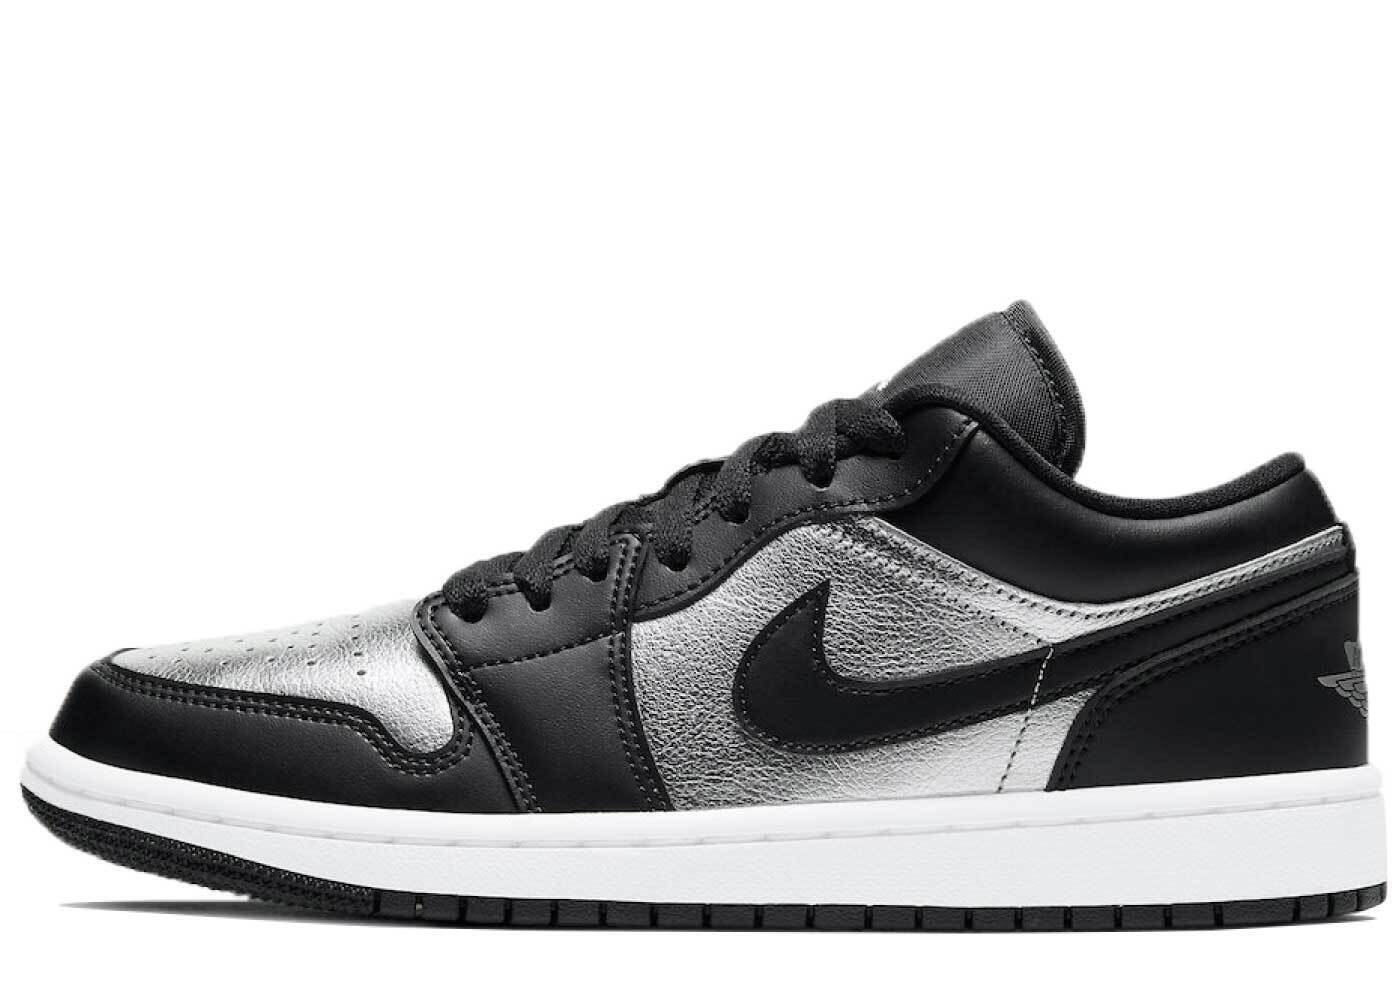 Nike Air Jordan 1 Low SE Black Metallic Silver Womensの写真